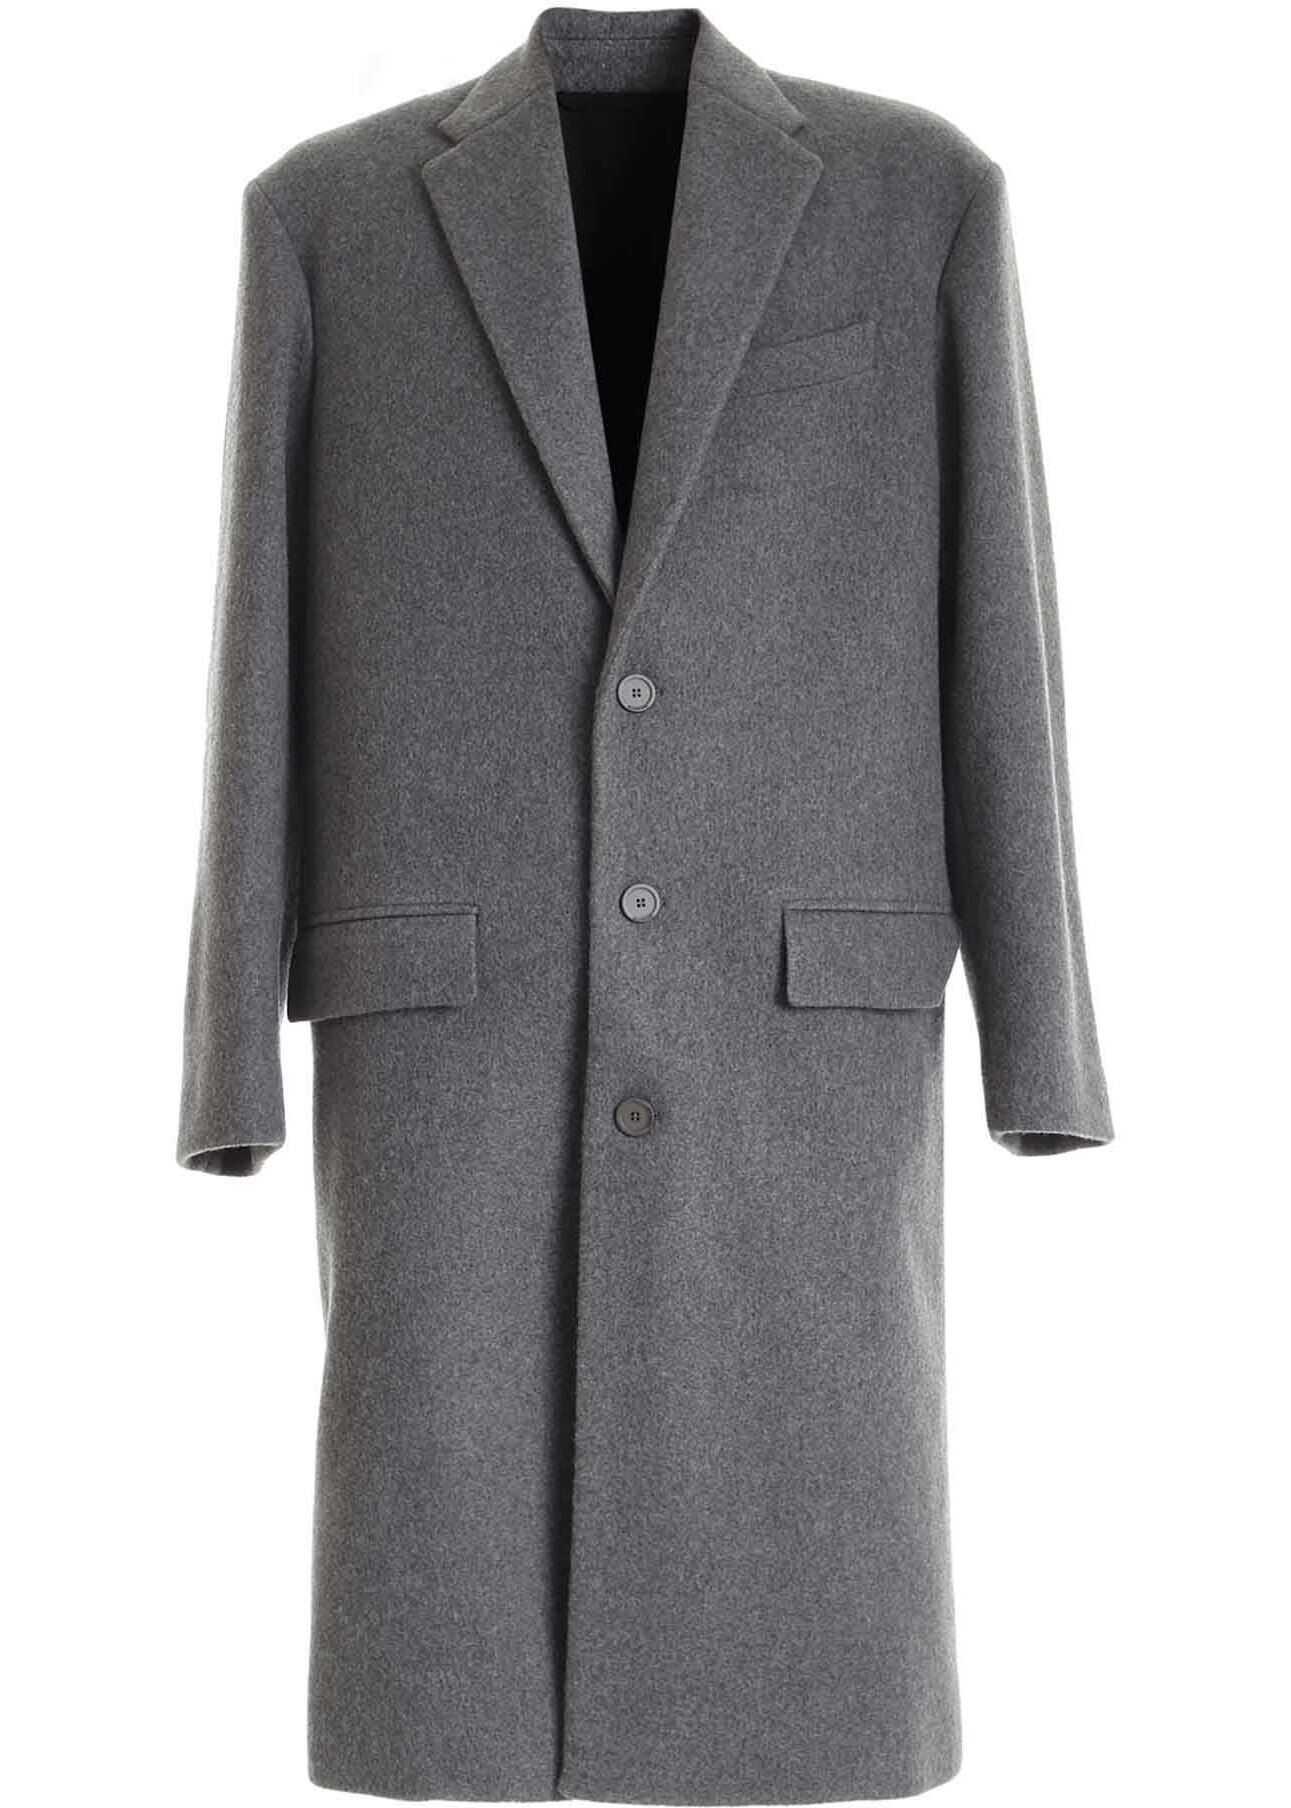 Balenciaga Oversize Fit Wool Coat In Melange Grey Black imagine